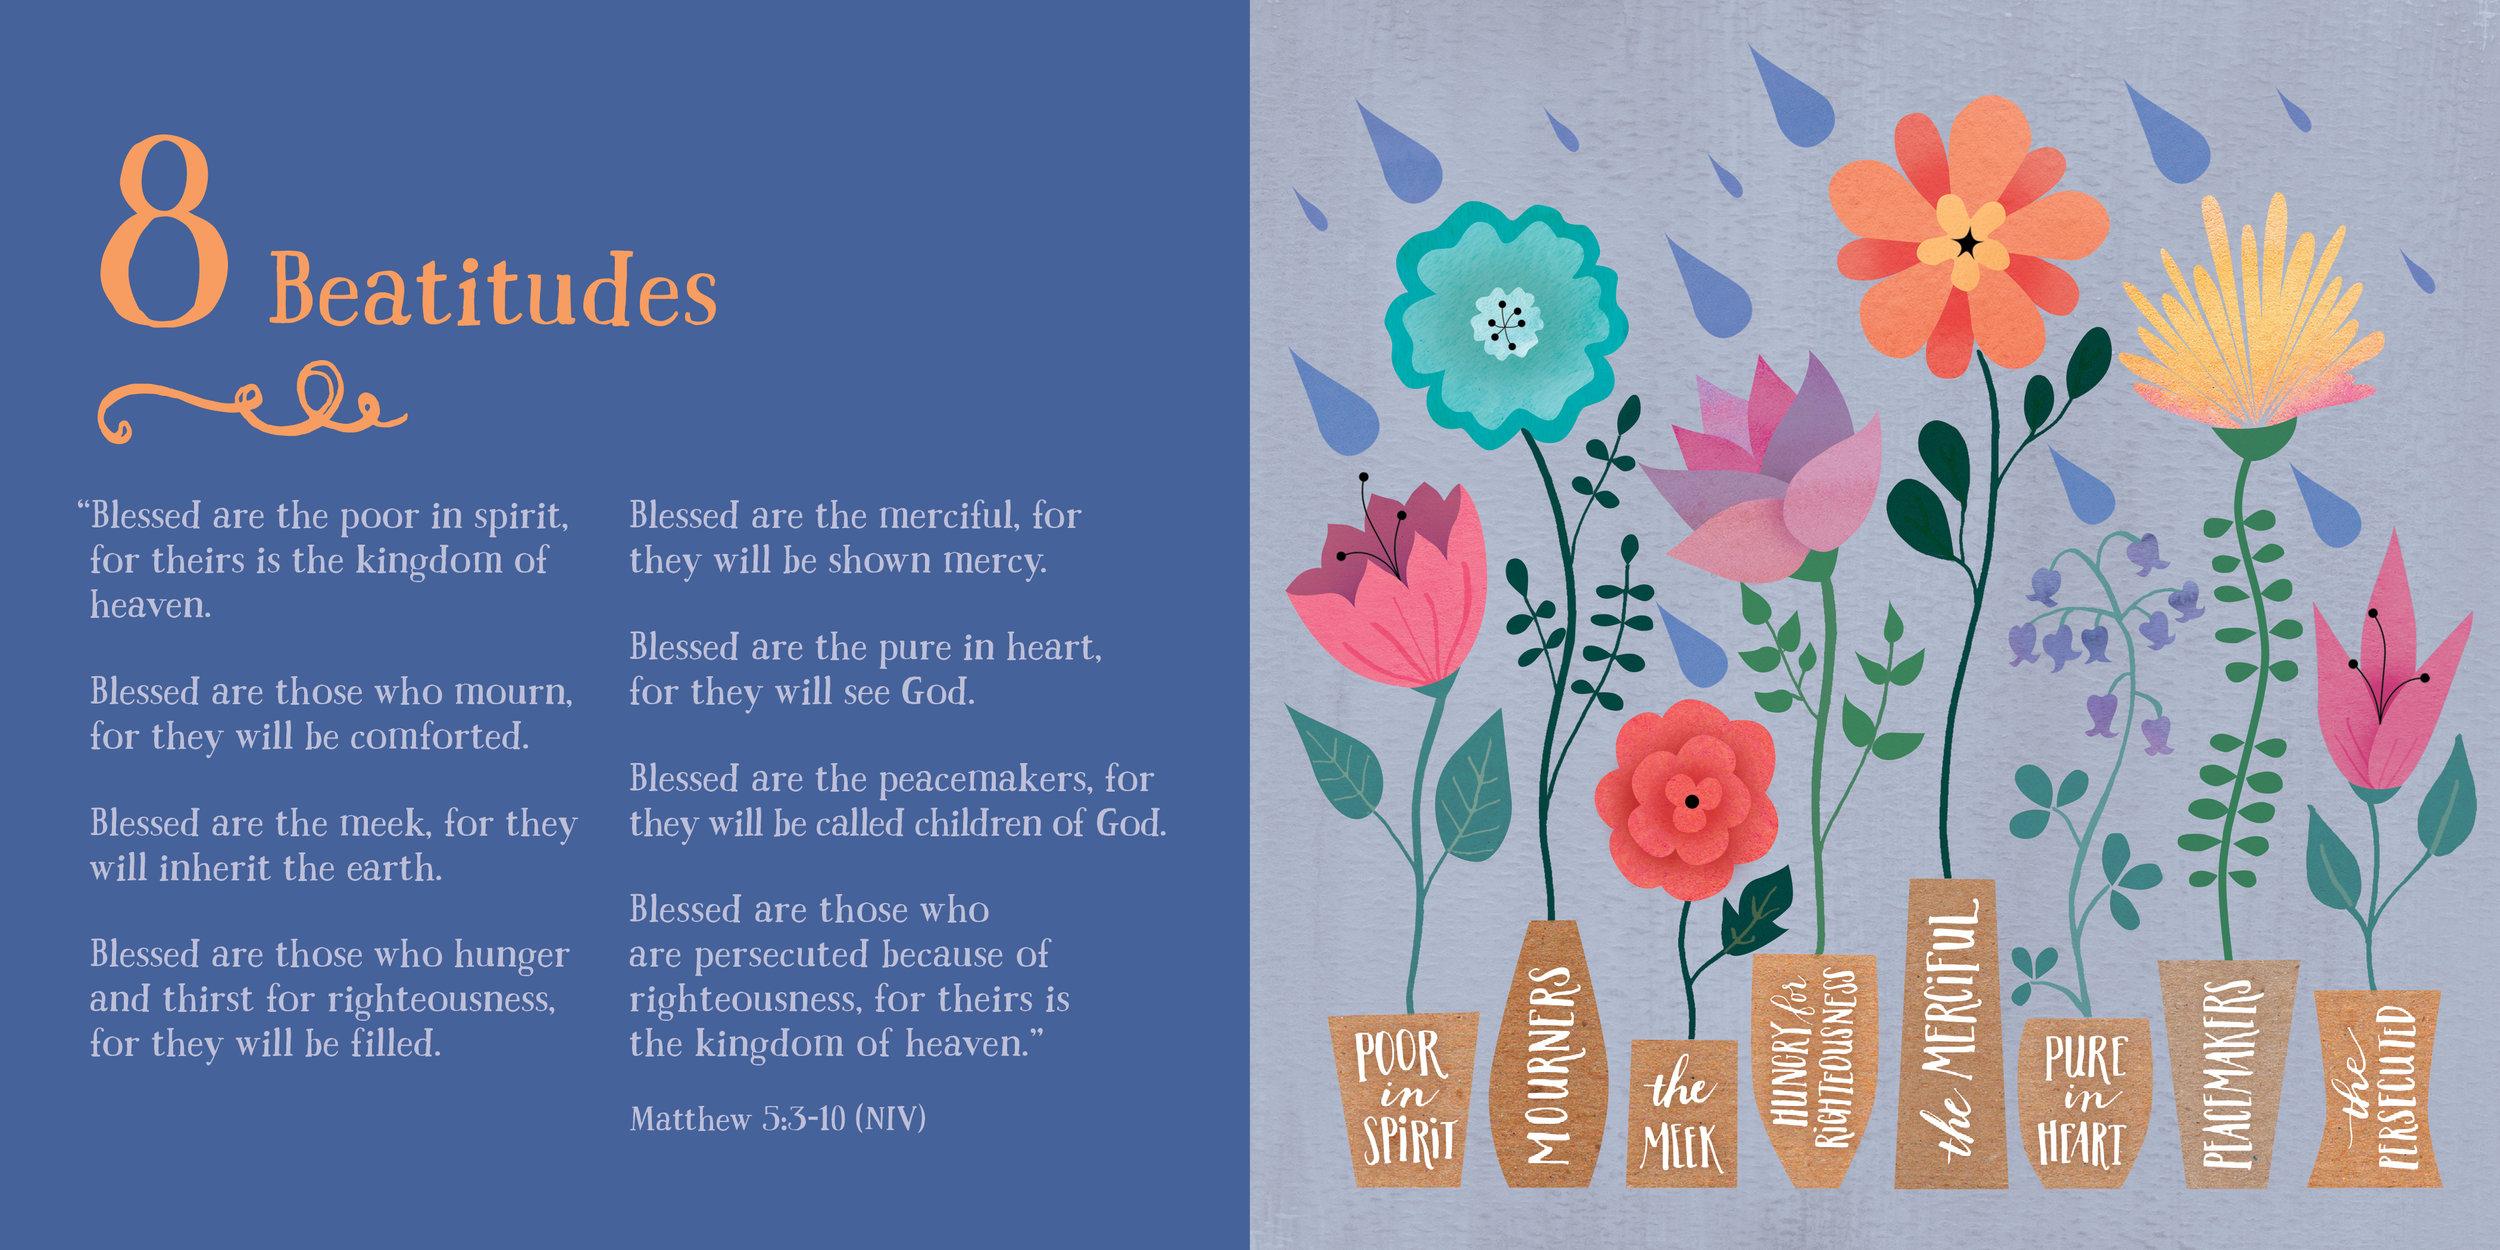 8-beatitudes-spread-illustration